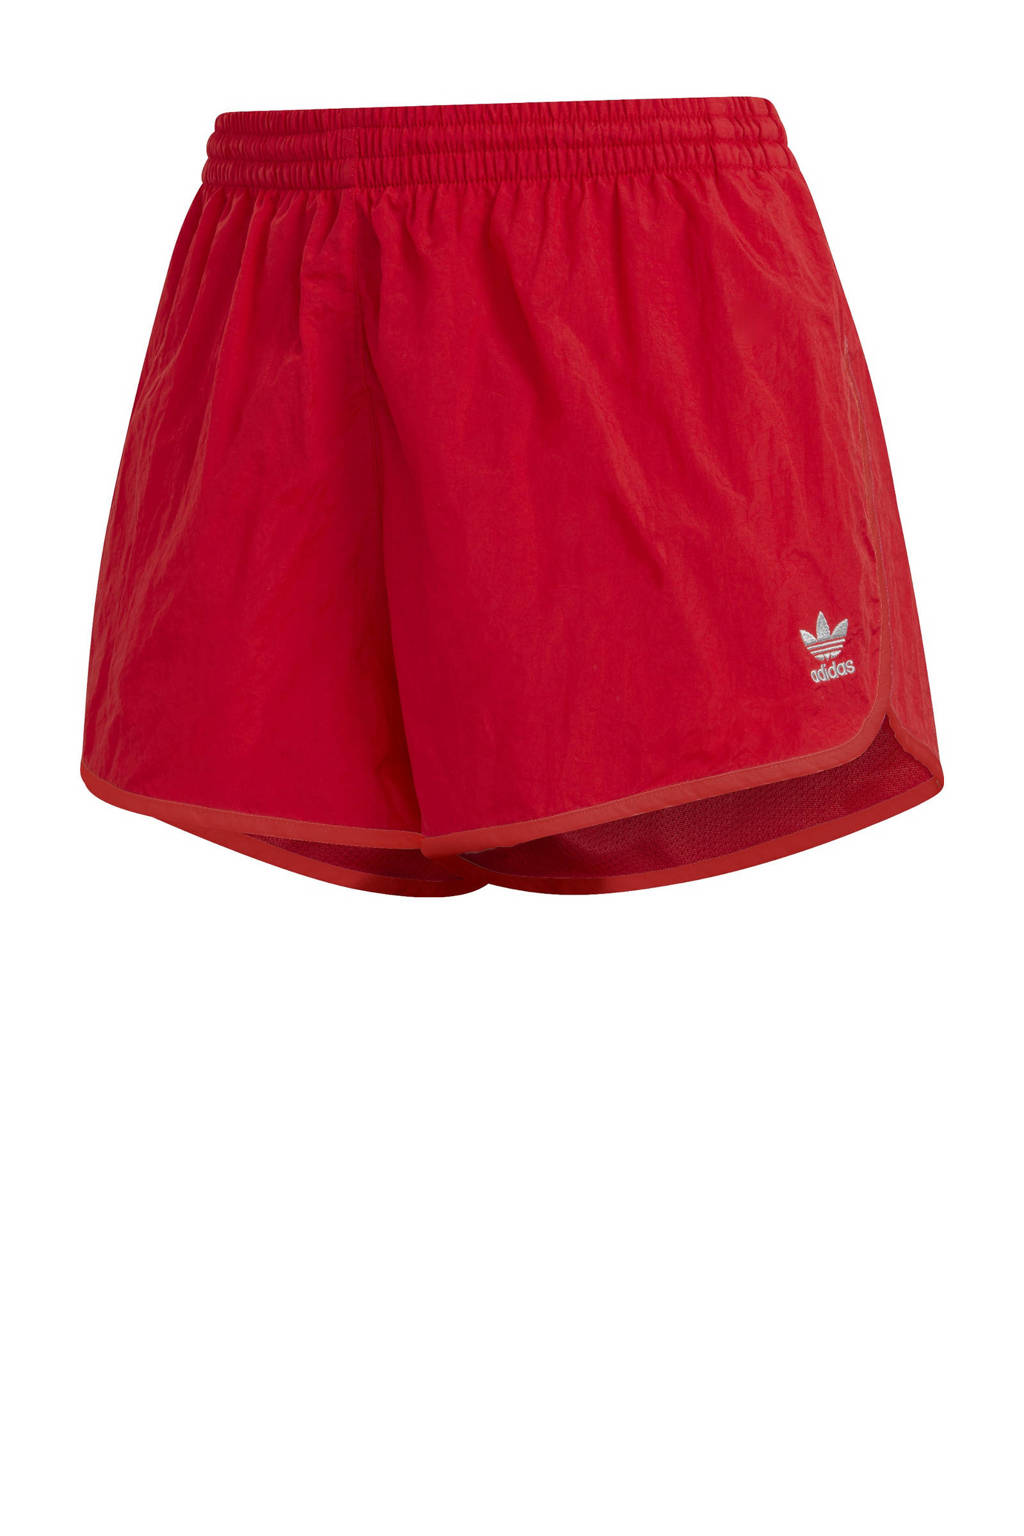 adidas Originals Adicolor short rood, Rood